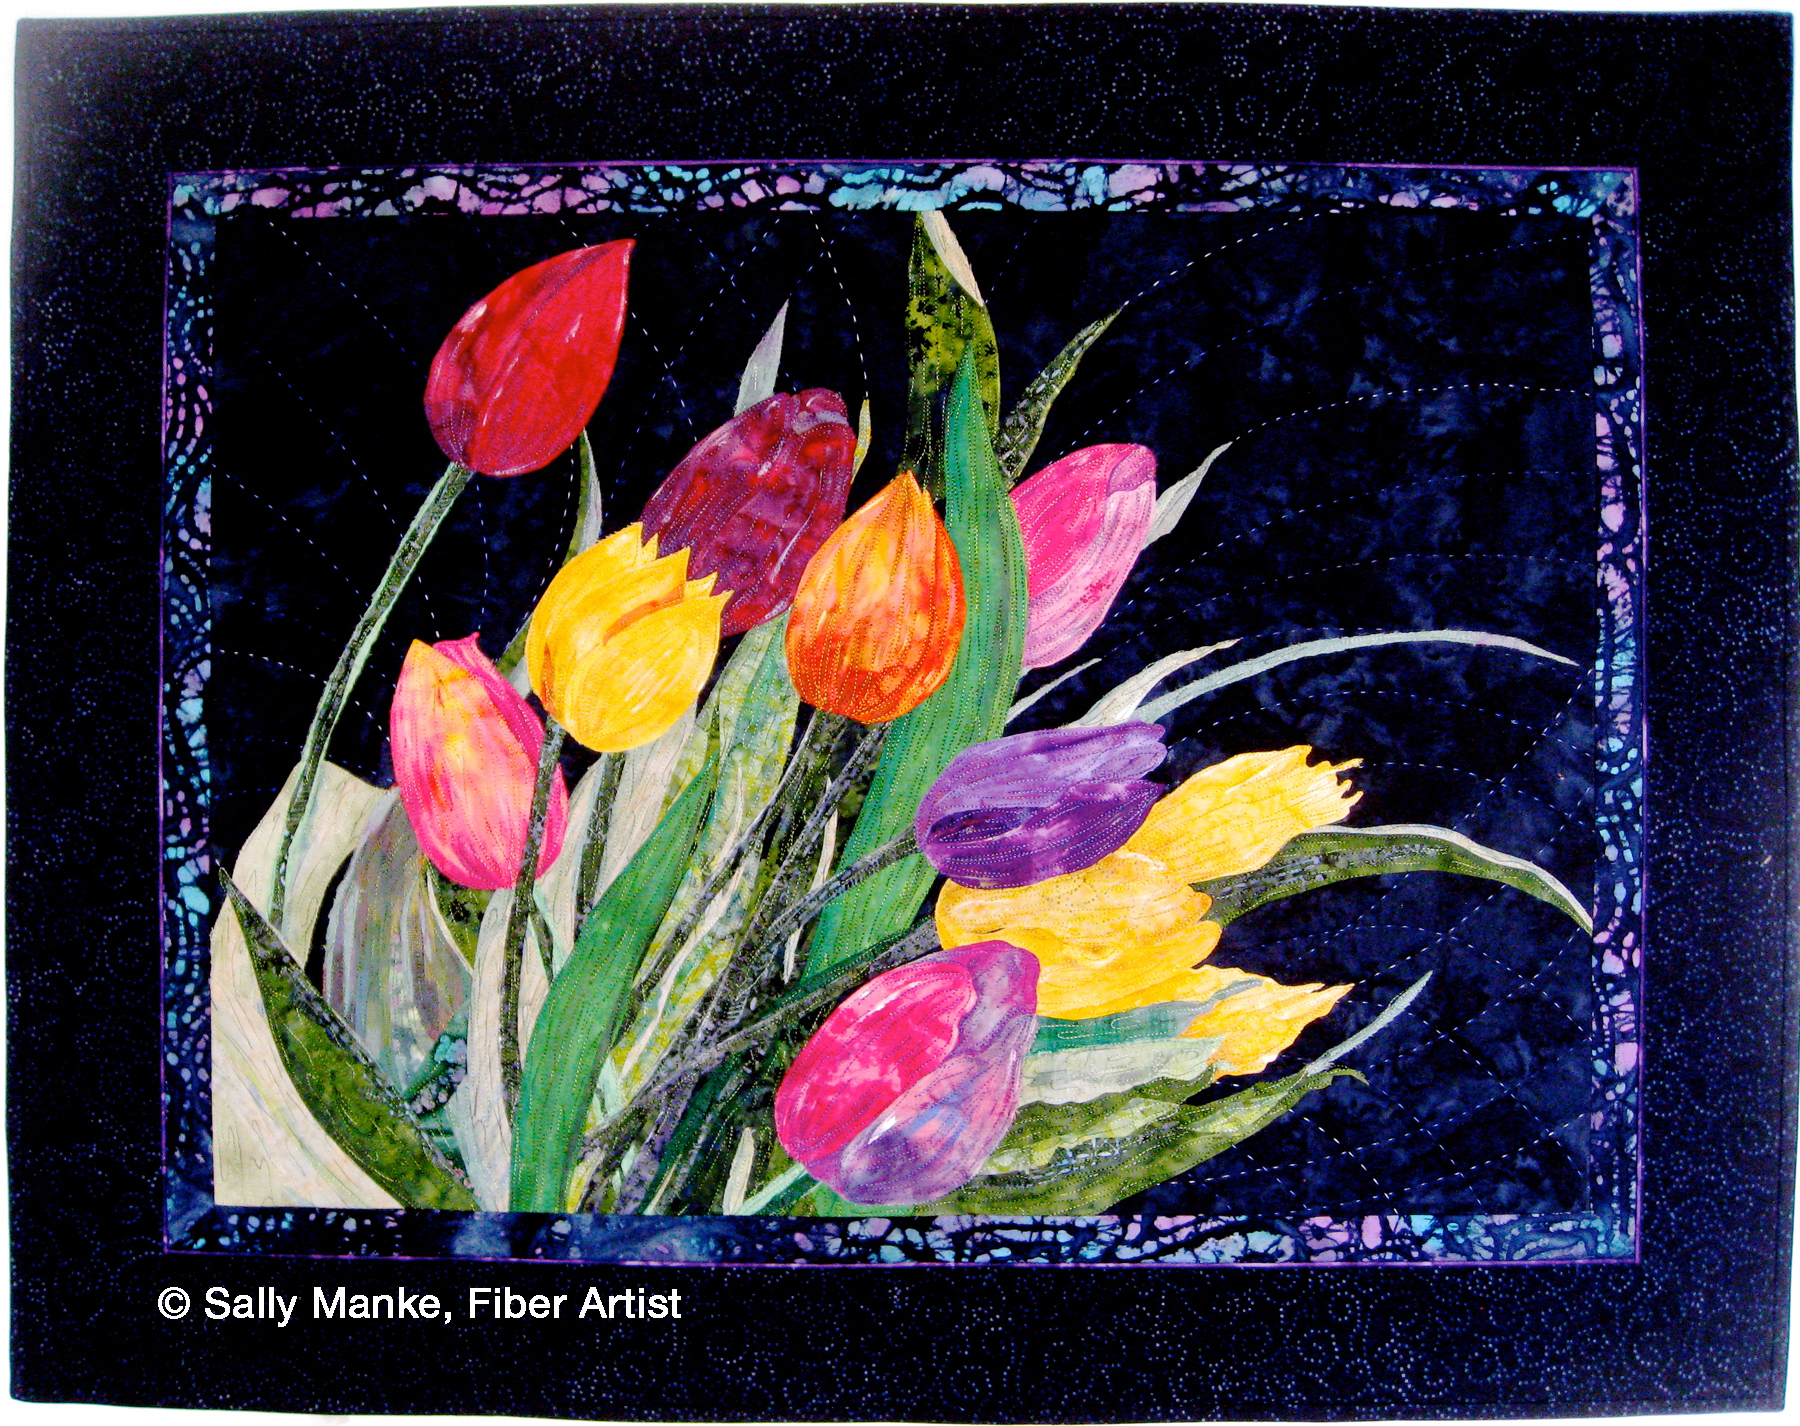 Wind Tossed Tulips